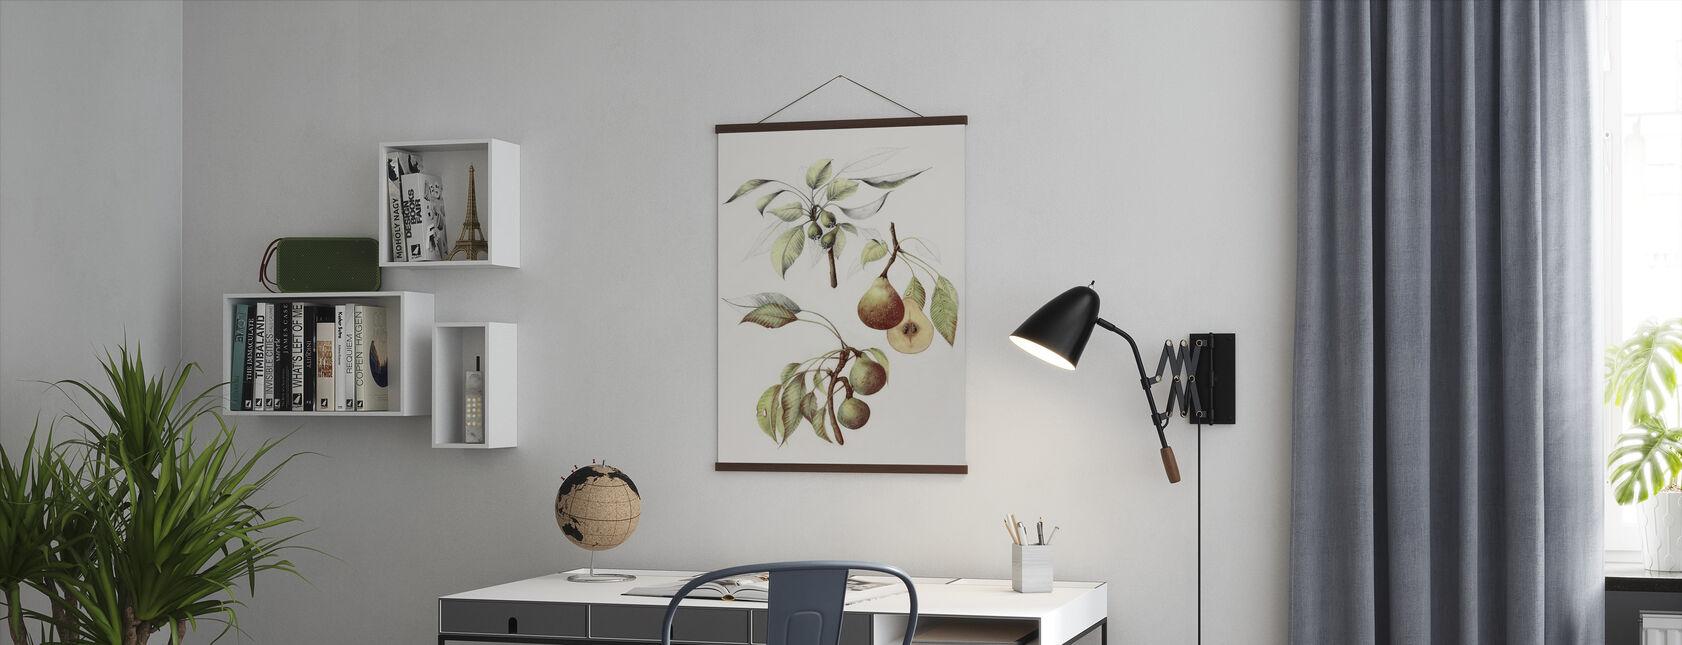 Pine Street Päron - Poster - Kontor